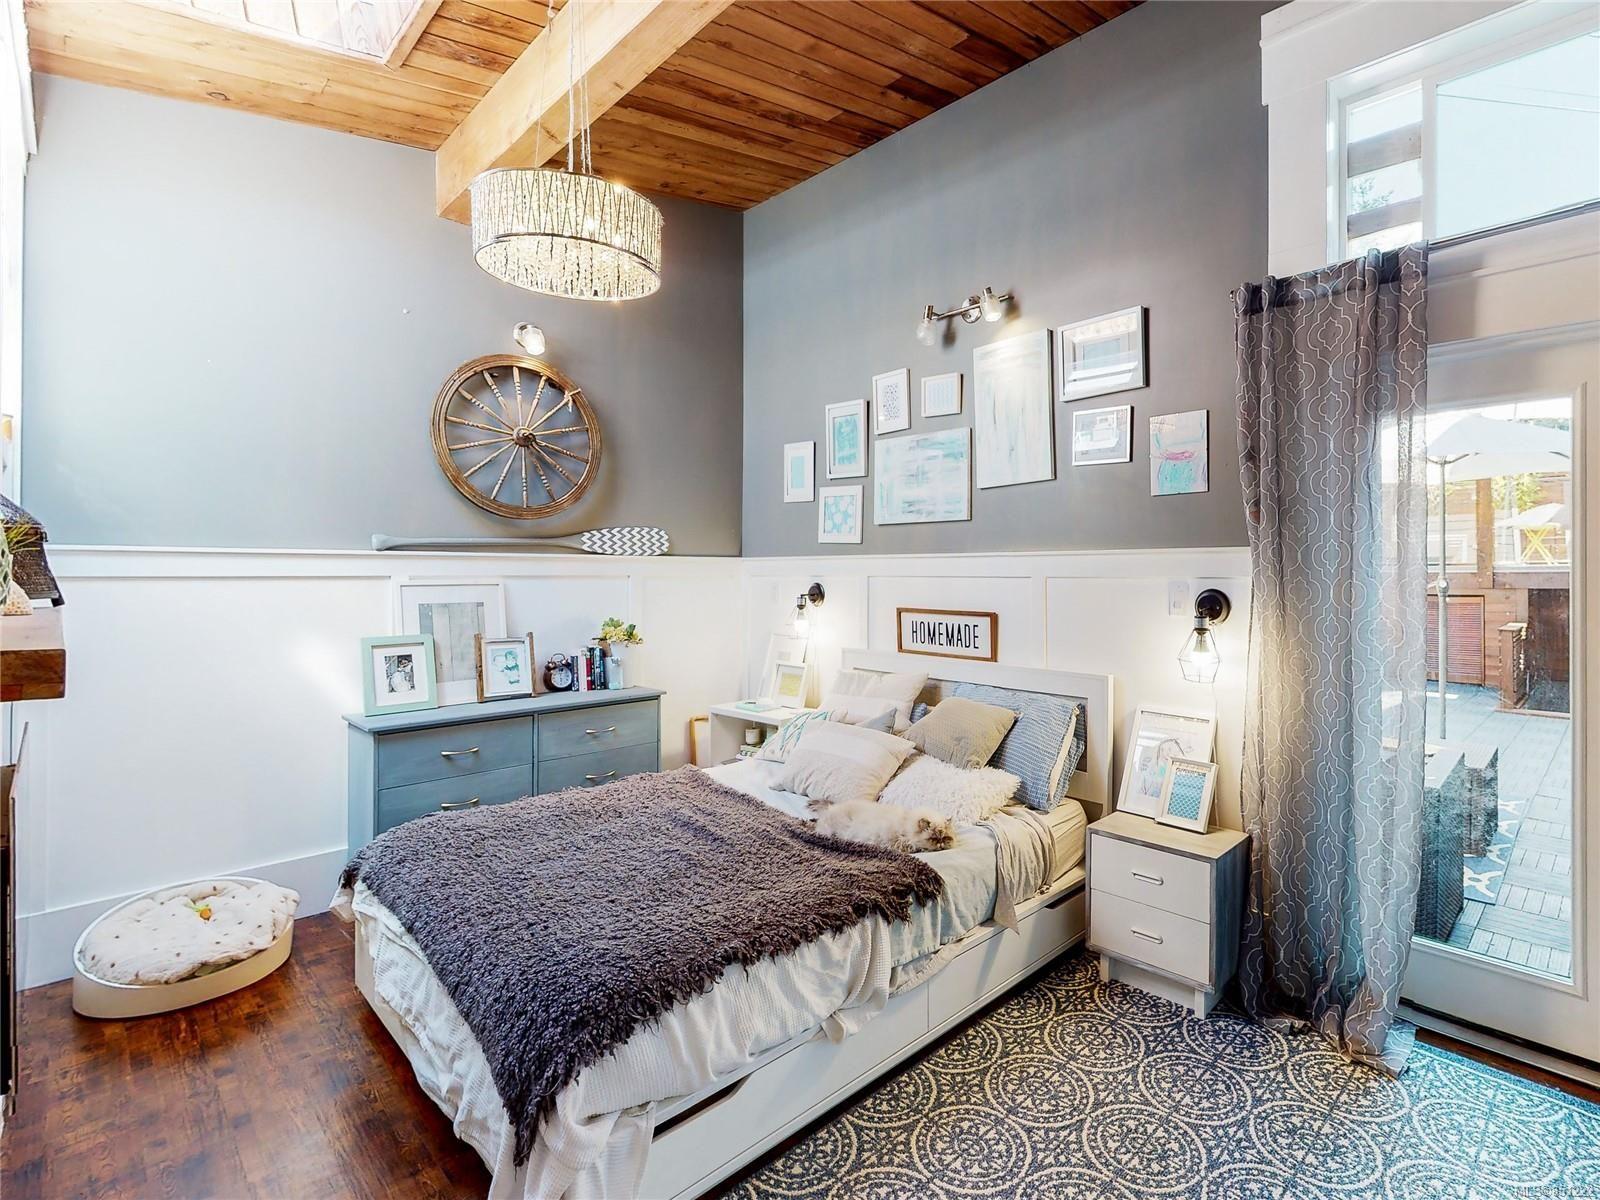 Photo 11: Photos: 2525 11th Ave in : PA Port Alberni House for sale (Port Alberni)  : MLS®# 851222